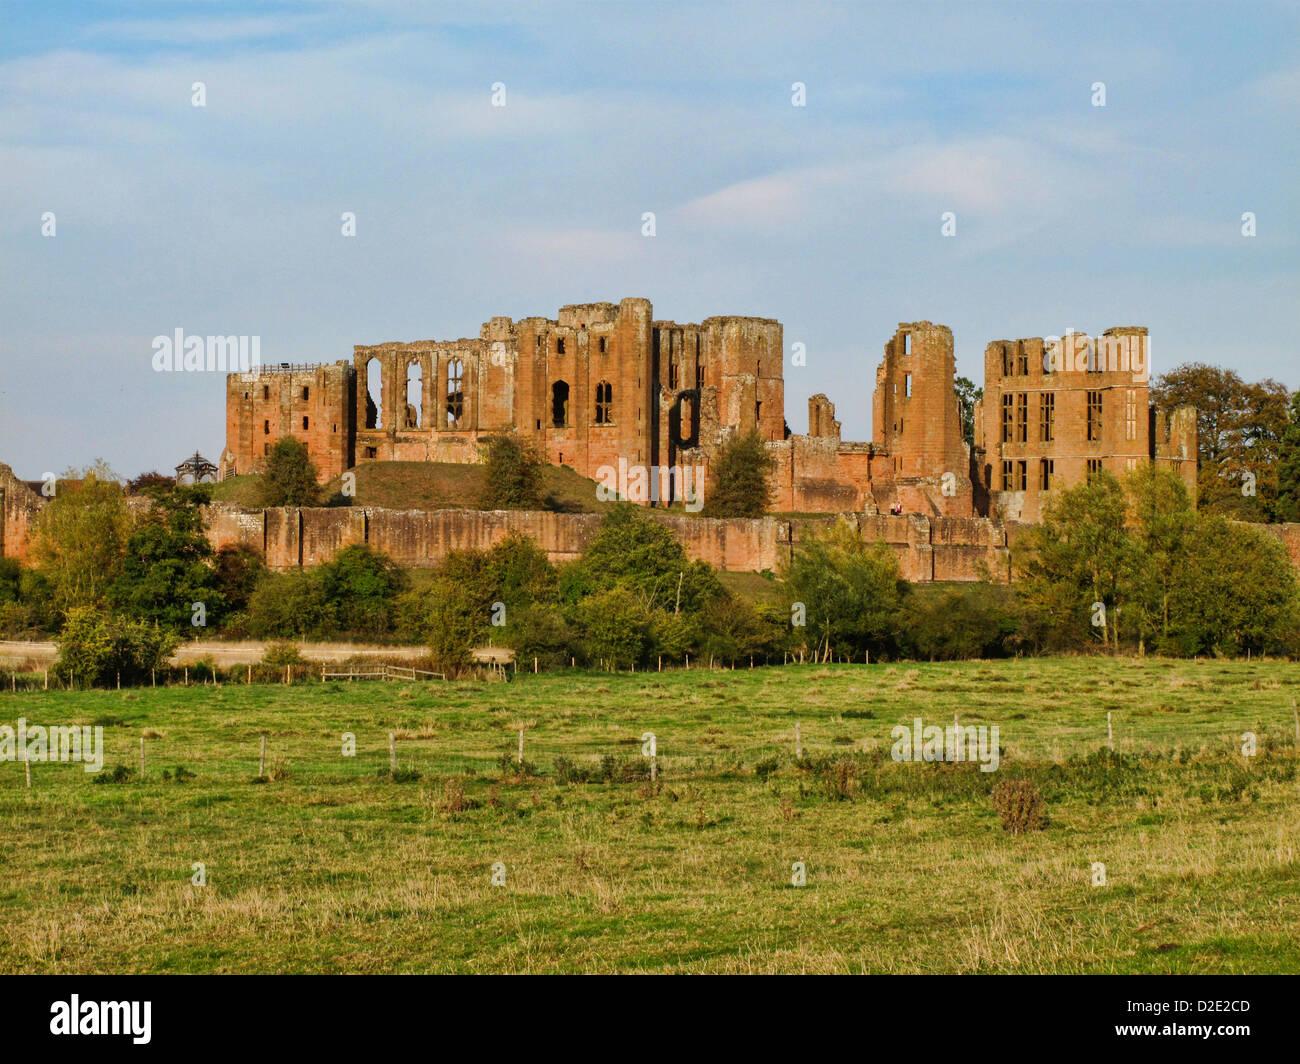 Kenilworth Castle, Kenilworth, Warwickshire, England - Stock Image